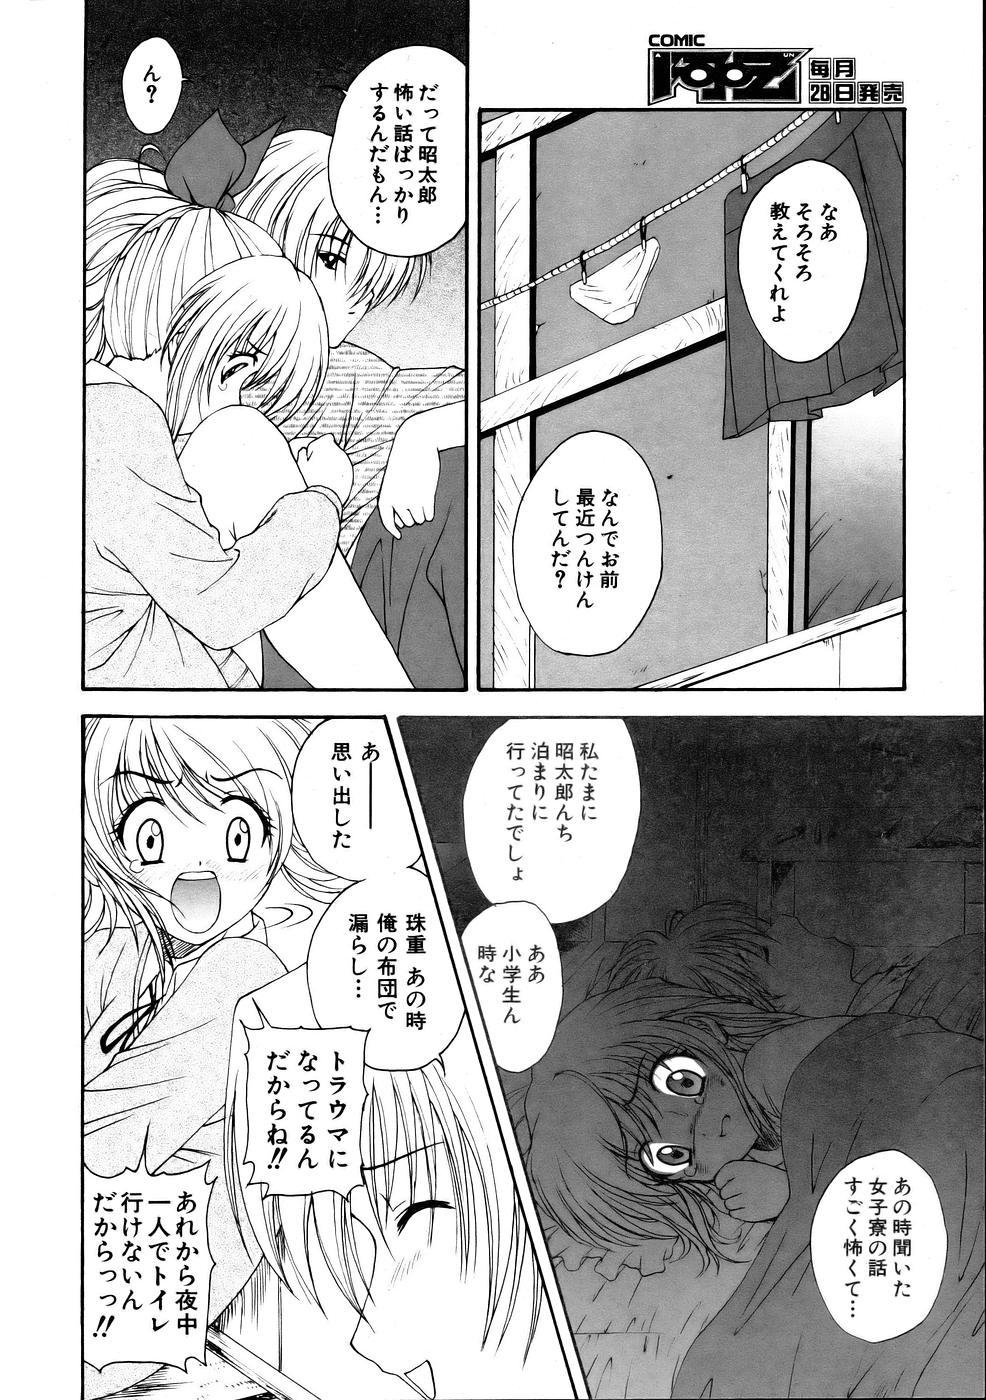 COMIC AUN 2005-10 Vol. 113 261